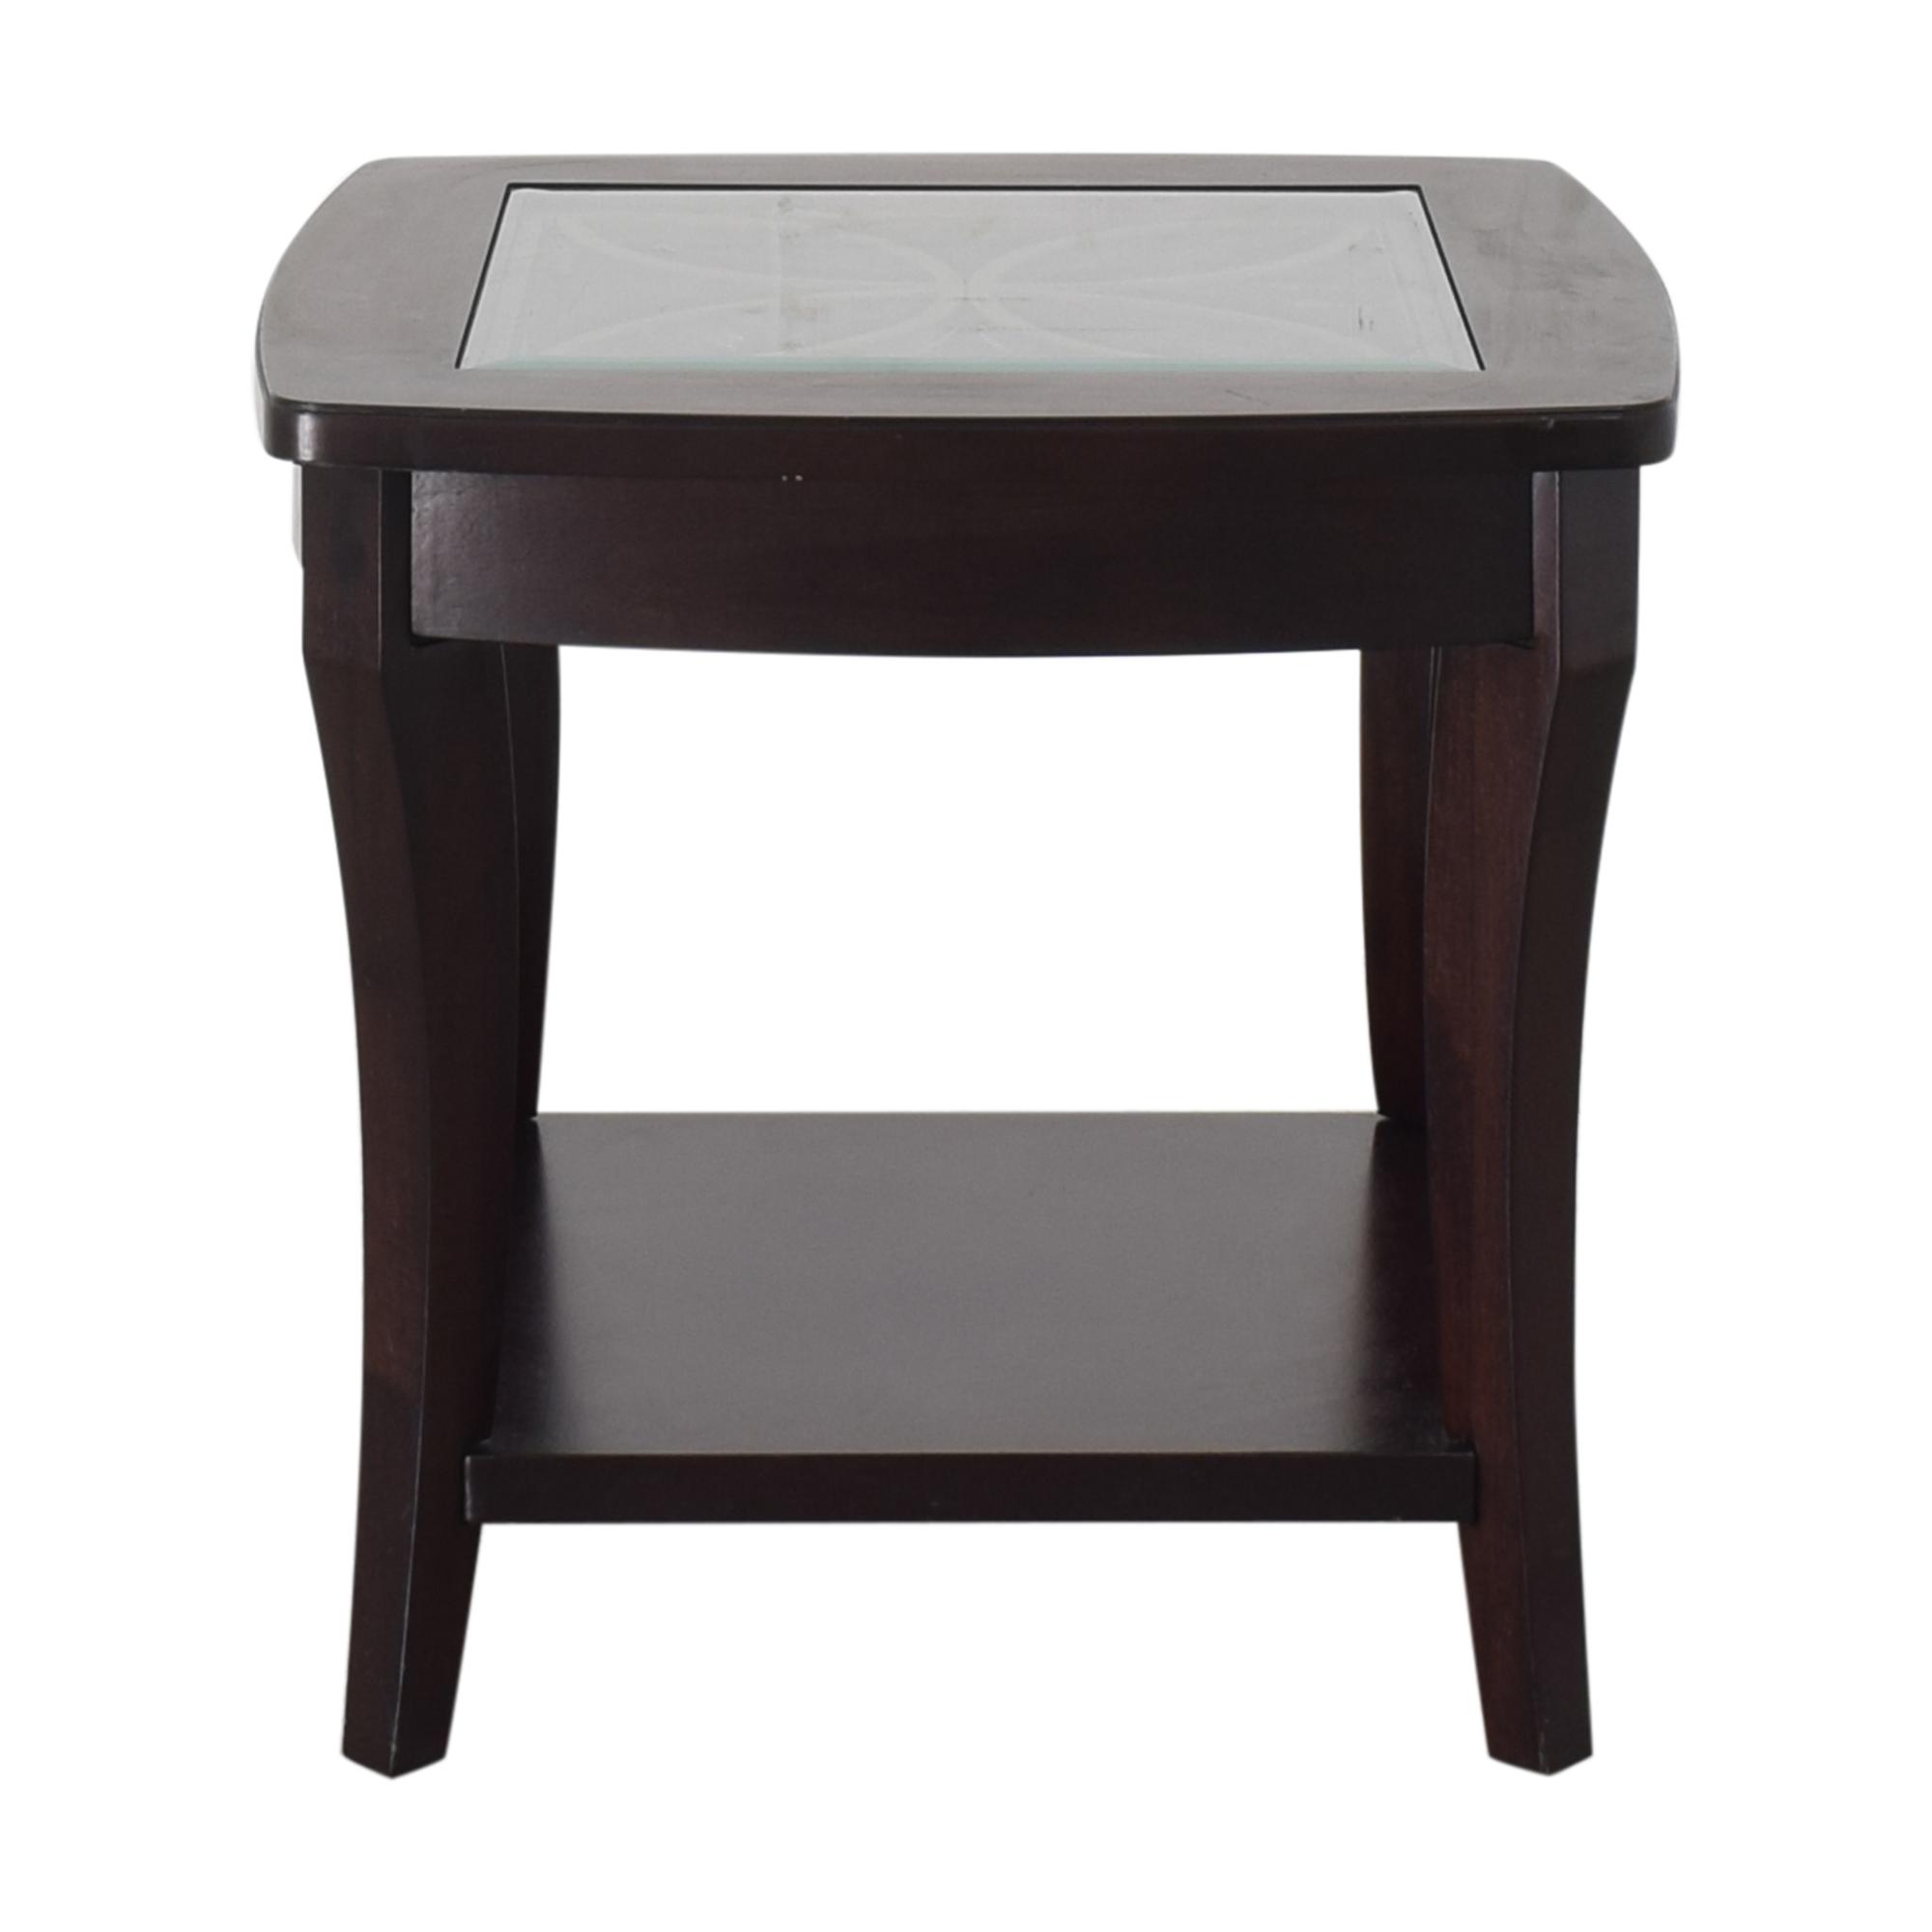 Riverside Furniture Riverside Furniture Annandale End Table price